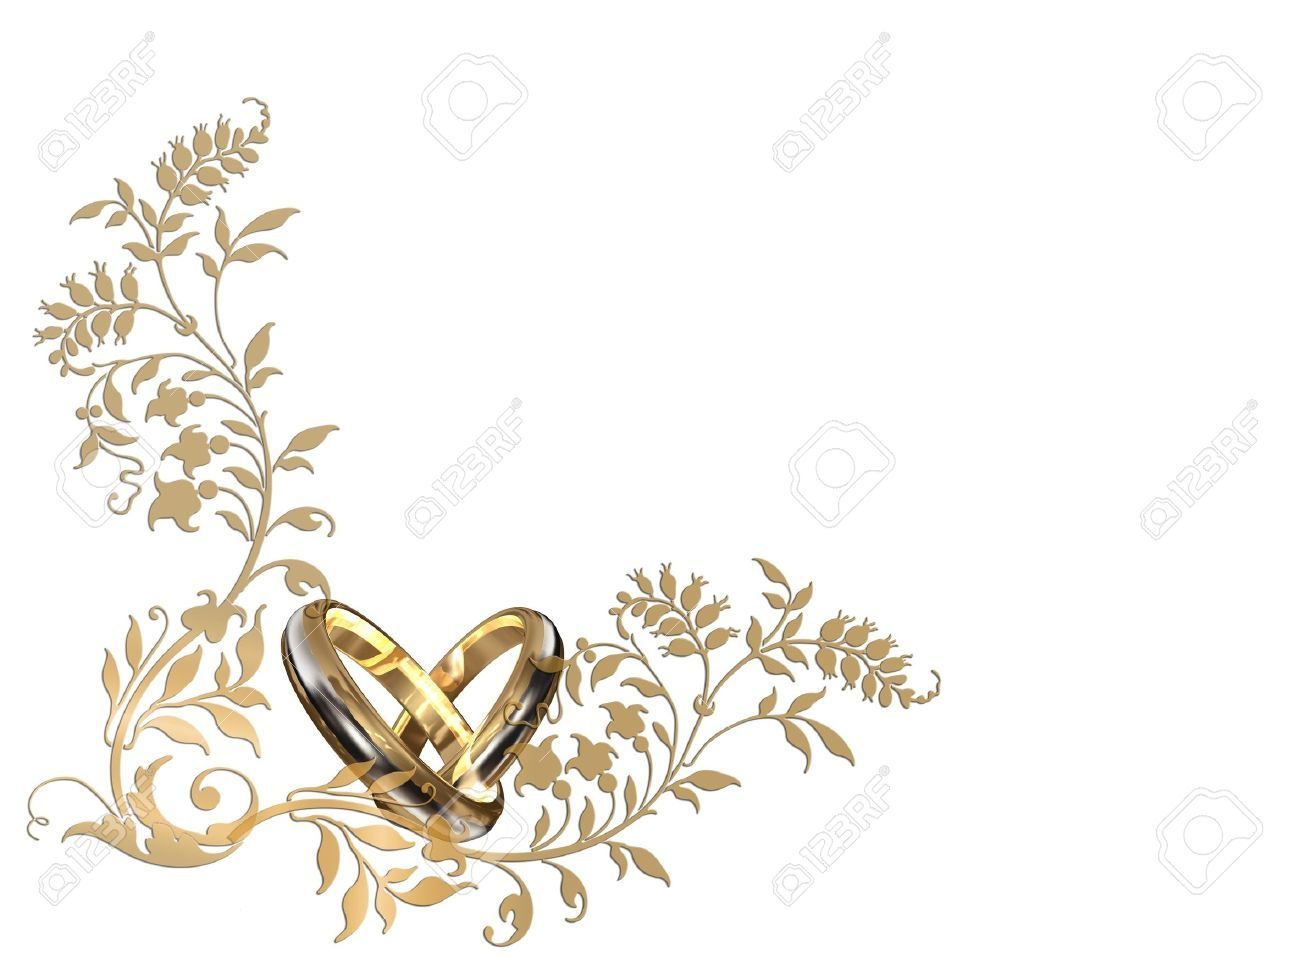 borda dourada para convite - Pesquisa Google | loja | Pinterest